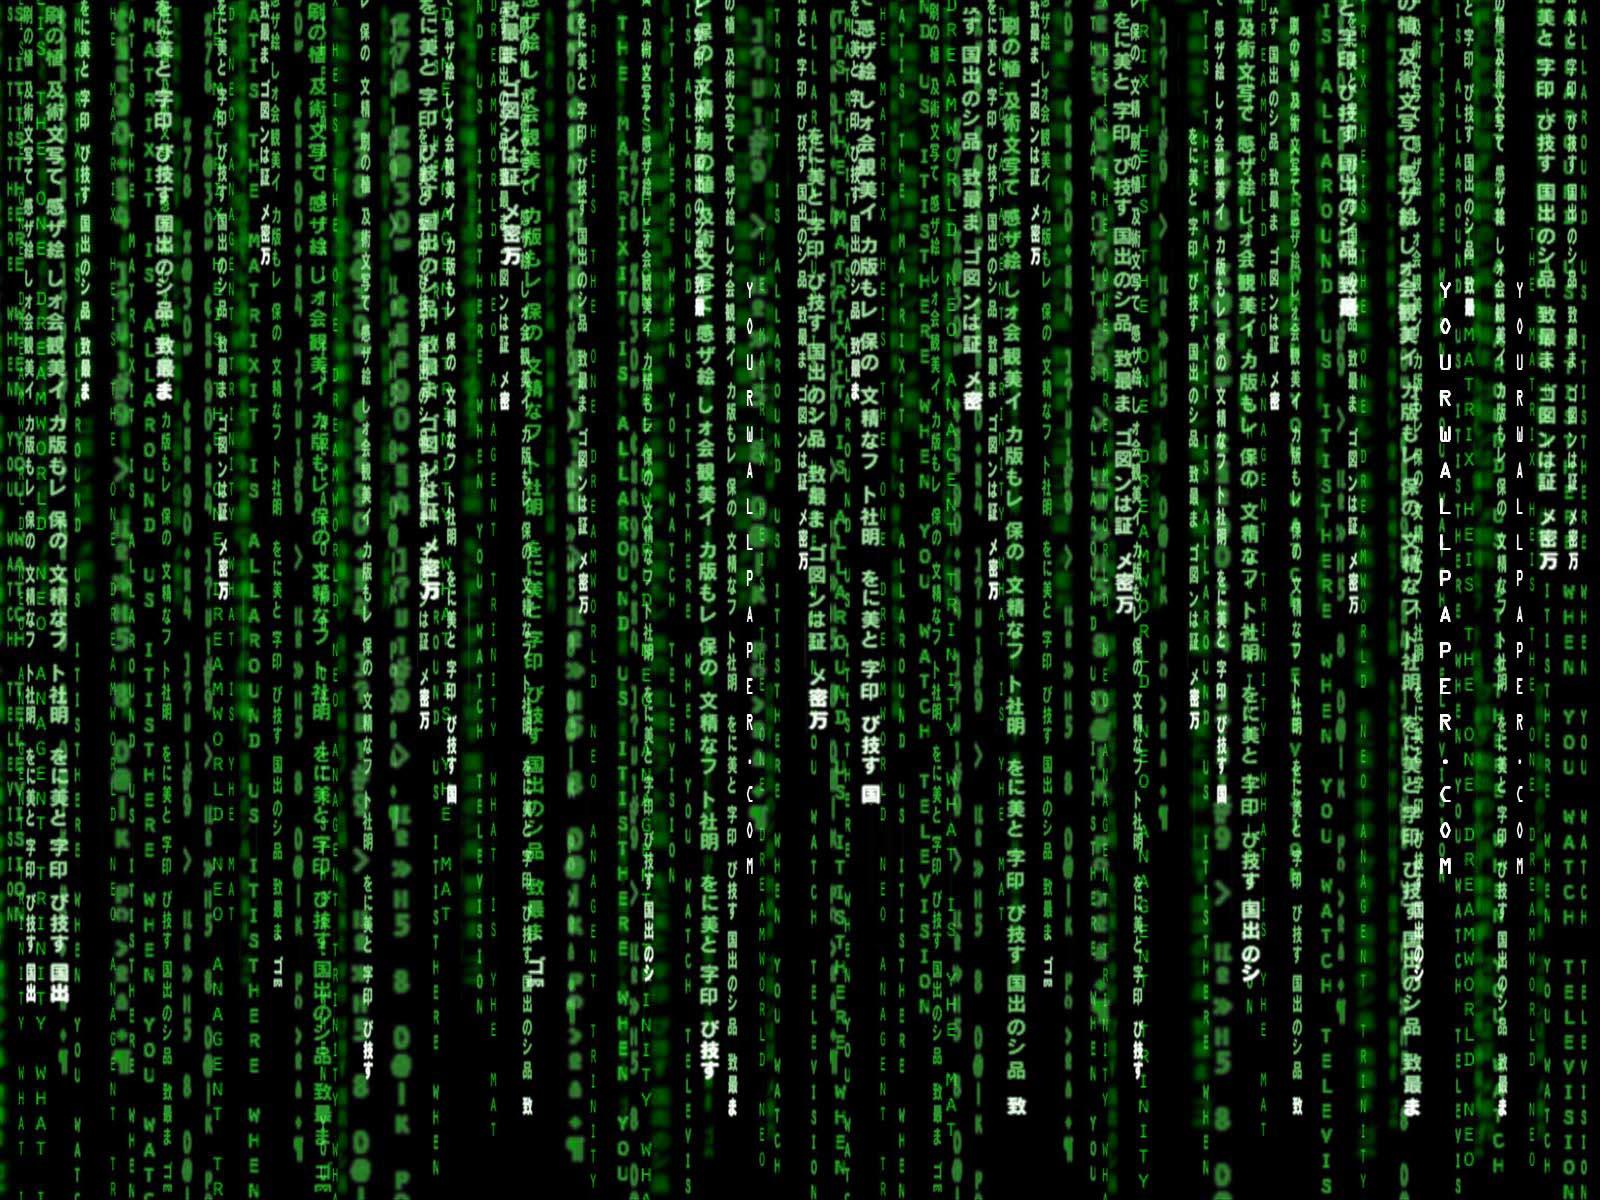 http://4.bp.blogspot.com/_Uf42tA7xWWA/S9cple7i84I/AAAAAAAABds/HCn4vXiO0cY/s1600/matrix-tut-2.jpg